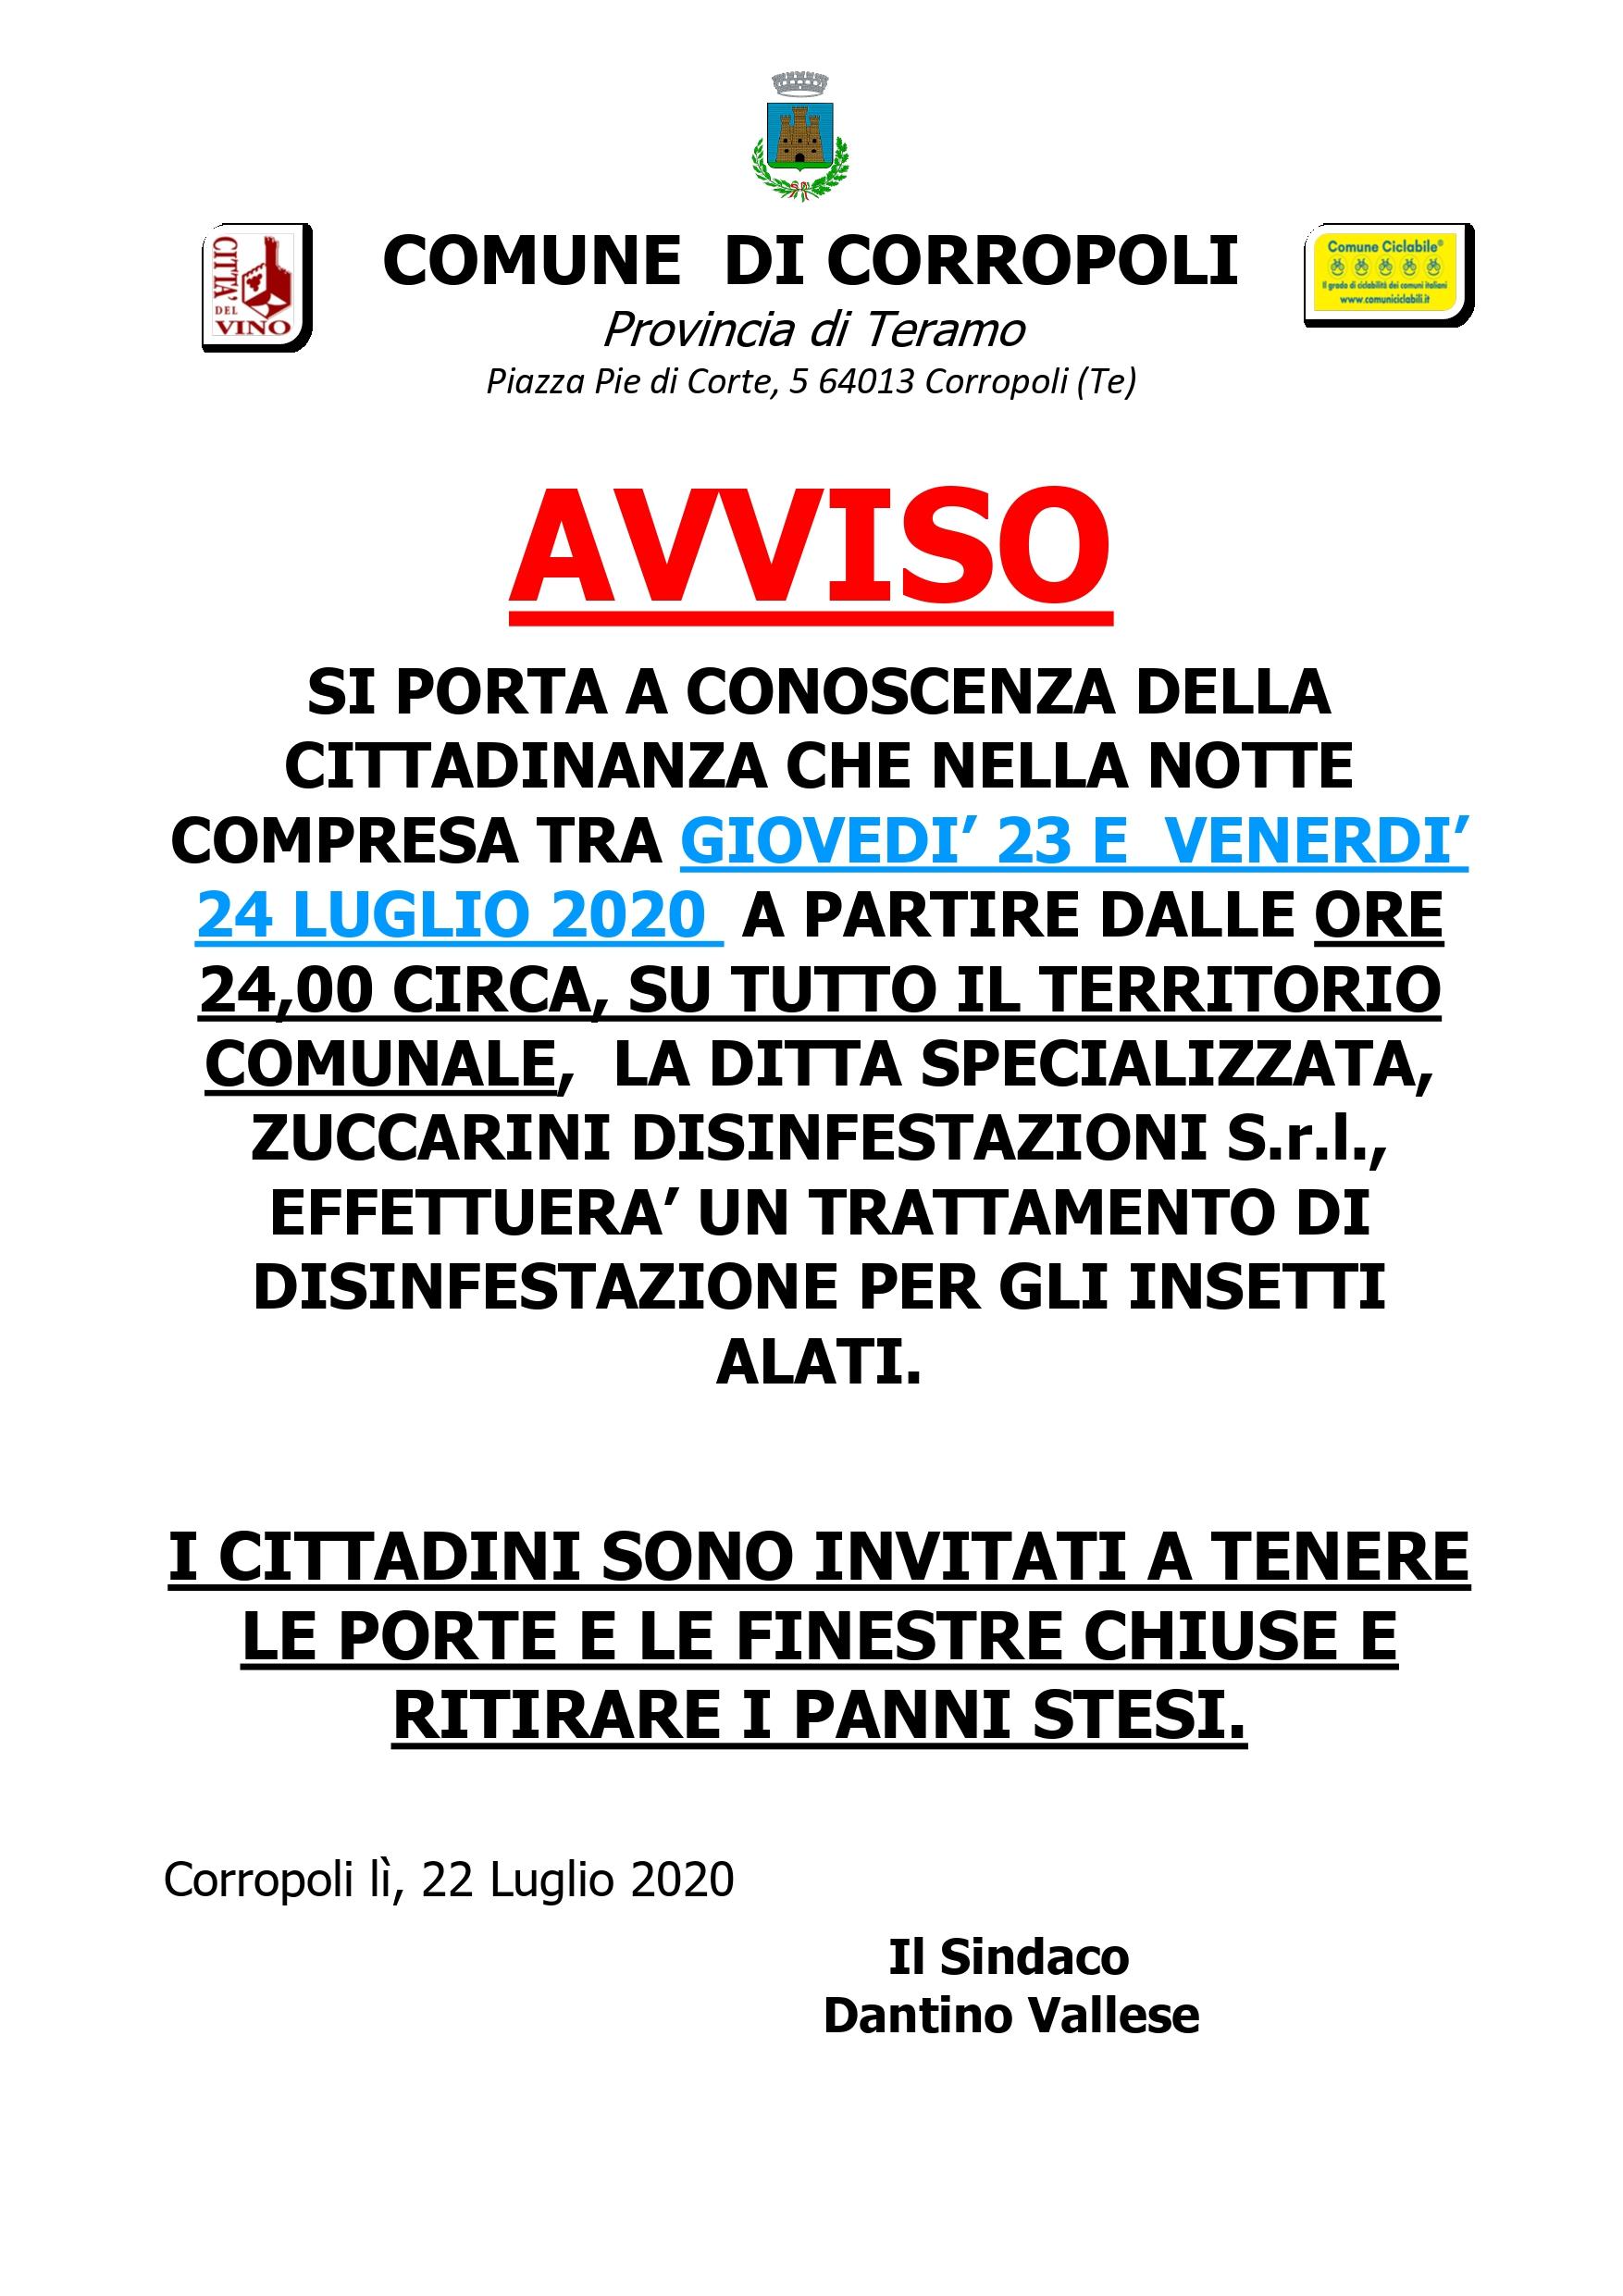 https://www.comune.corropoli.te.it/images/03.Avviso_page-0001%20(1).jpg